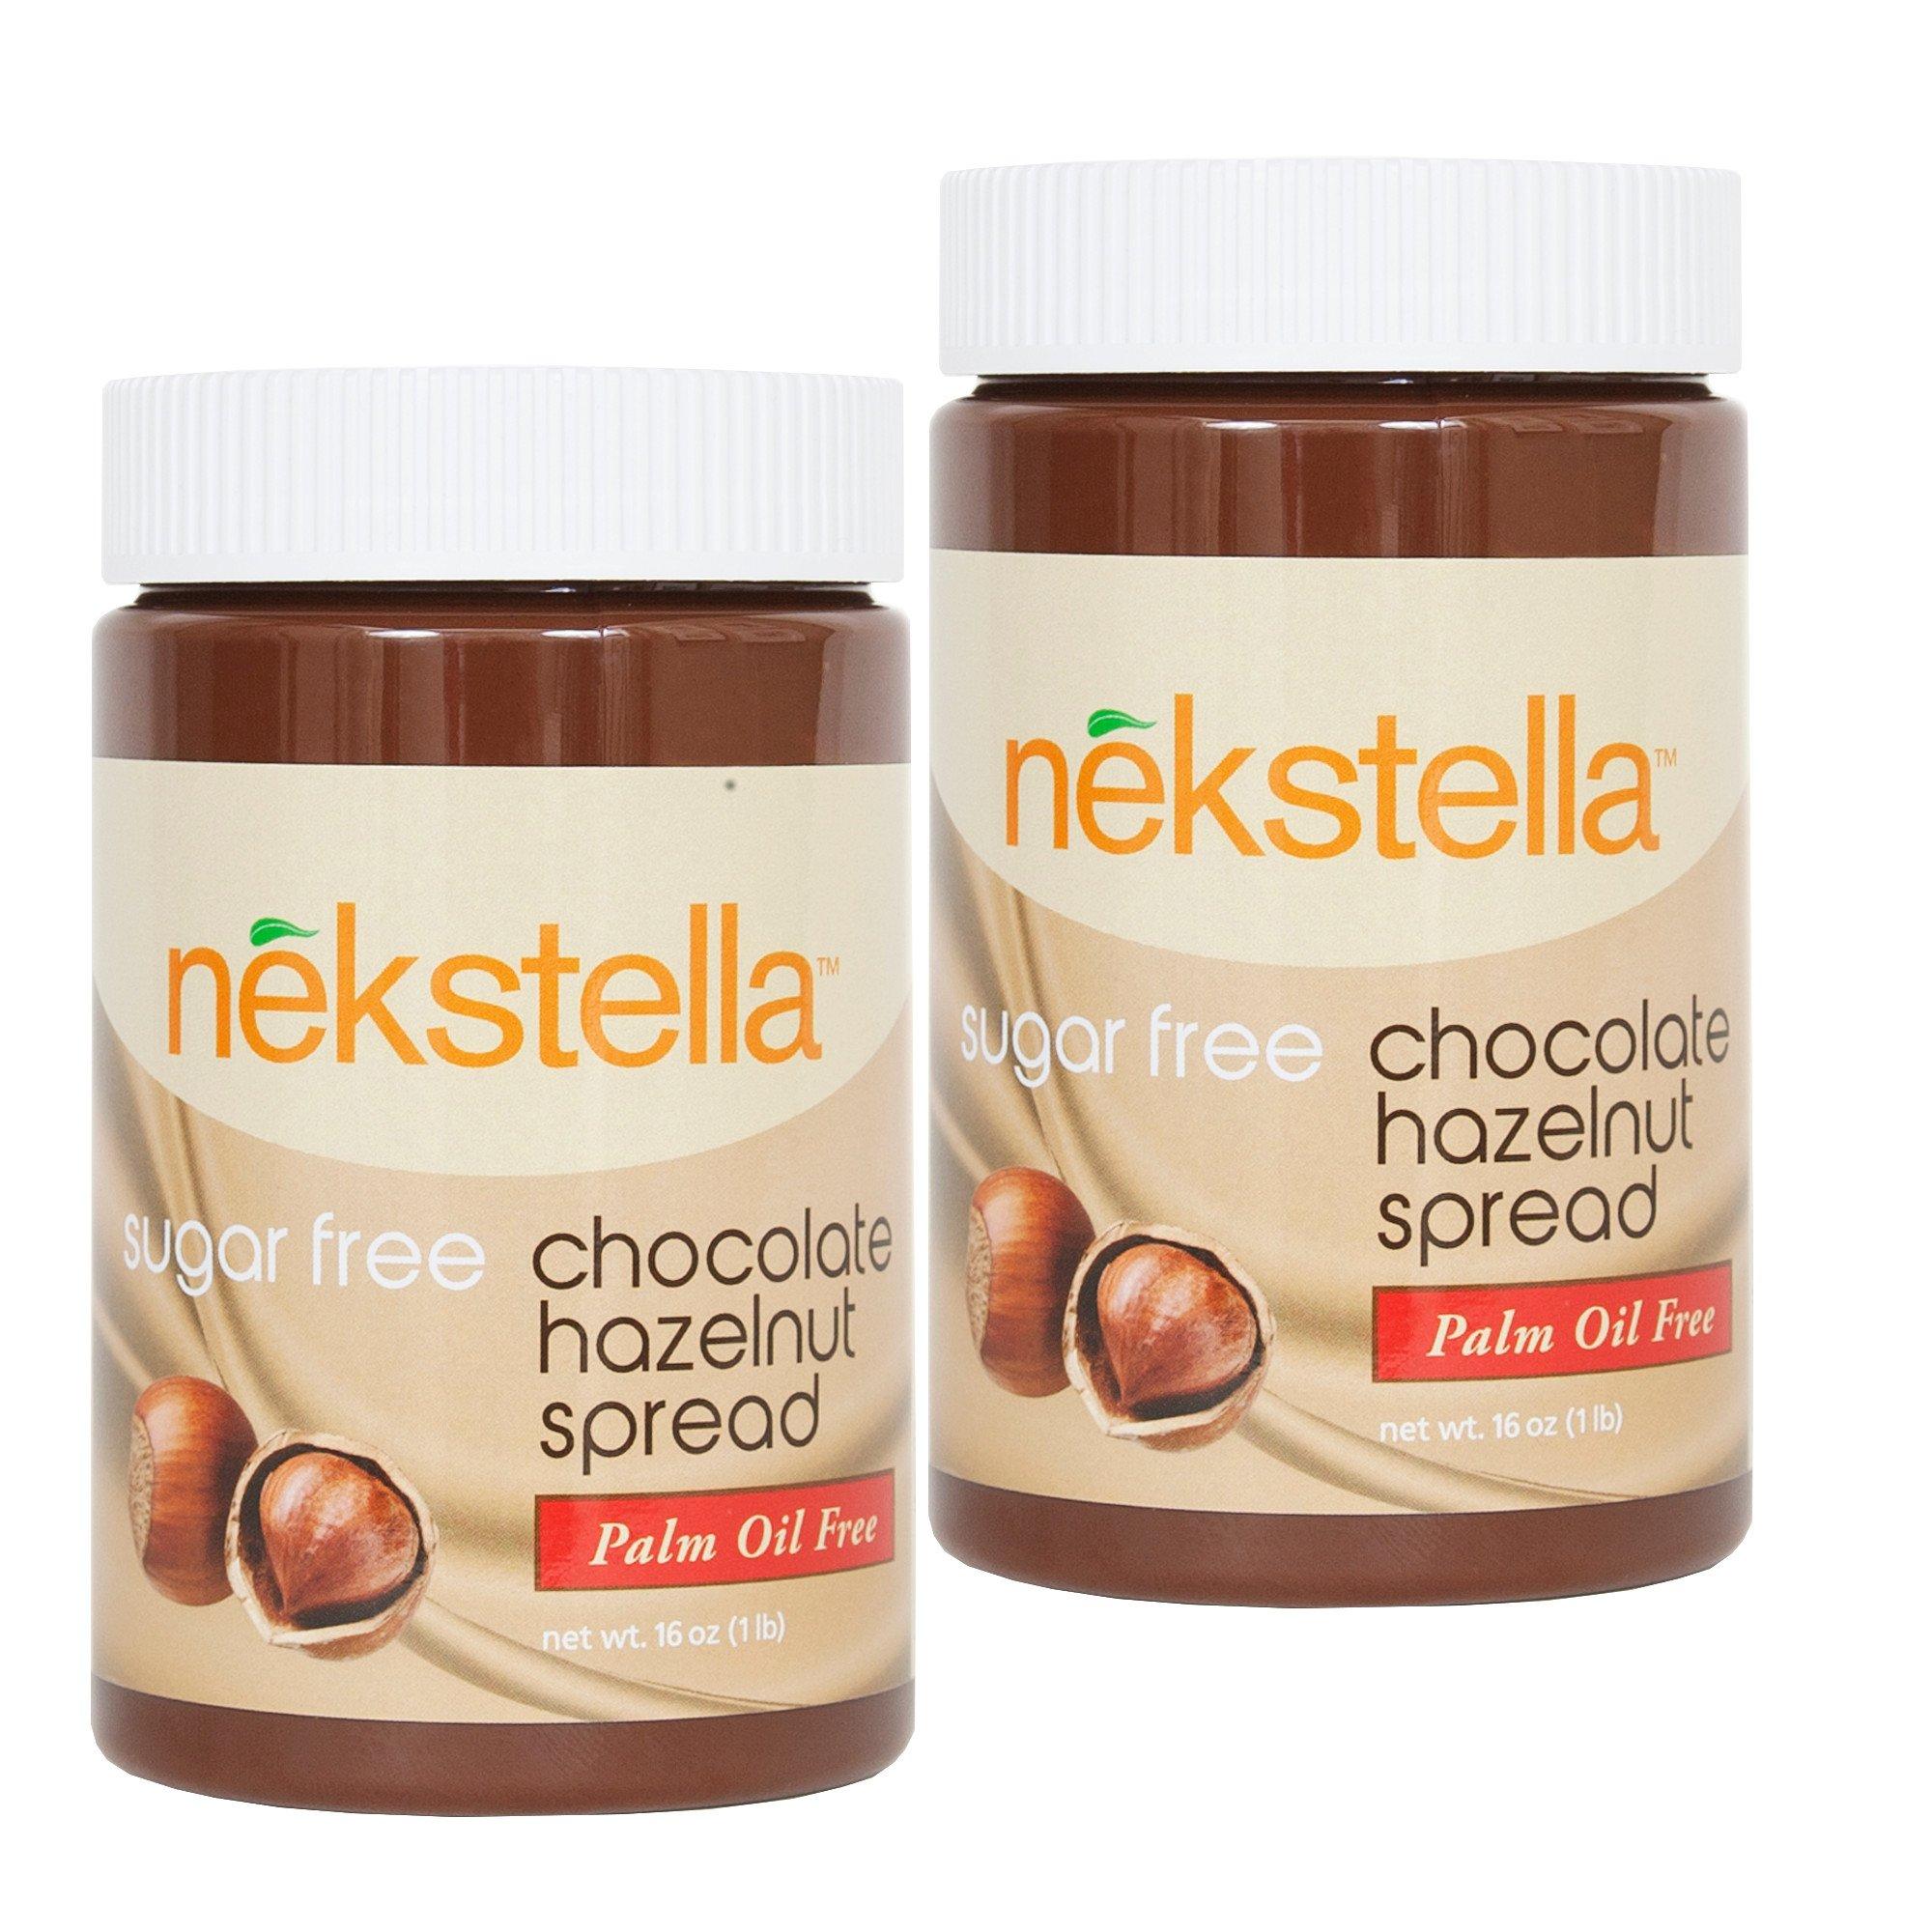 nekstella 16 oz jar Sugar Free Low Carb Chocolate Hazelnut Spread - (2 pack) by nekstellaTM